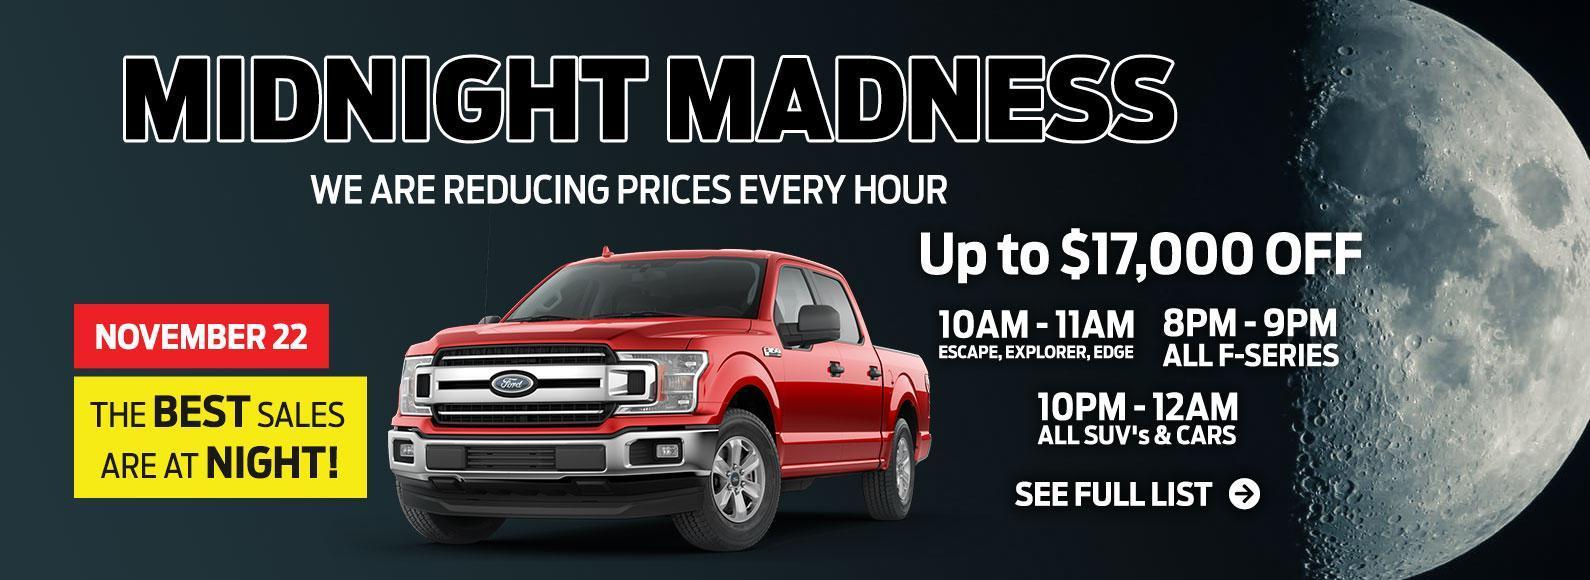 Midnight Madness Sale